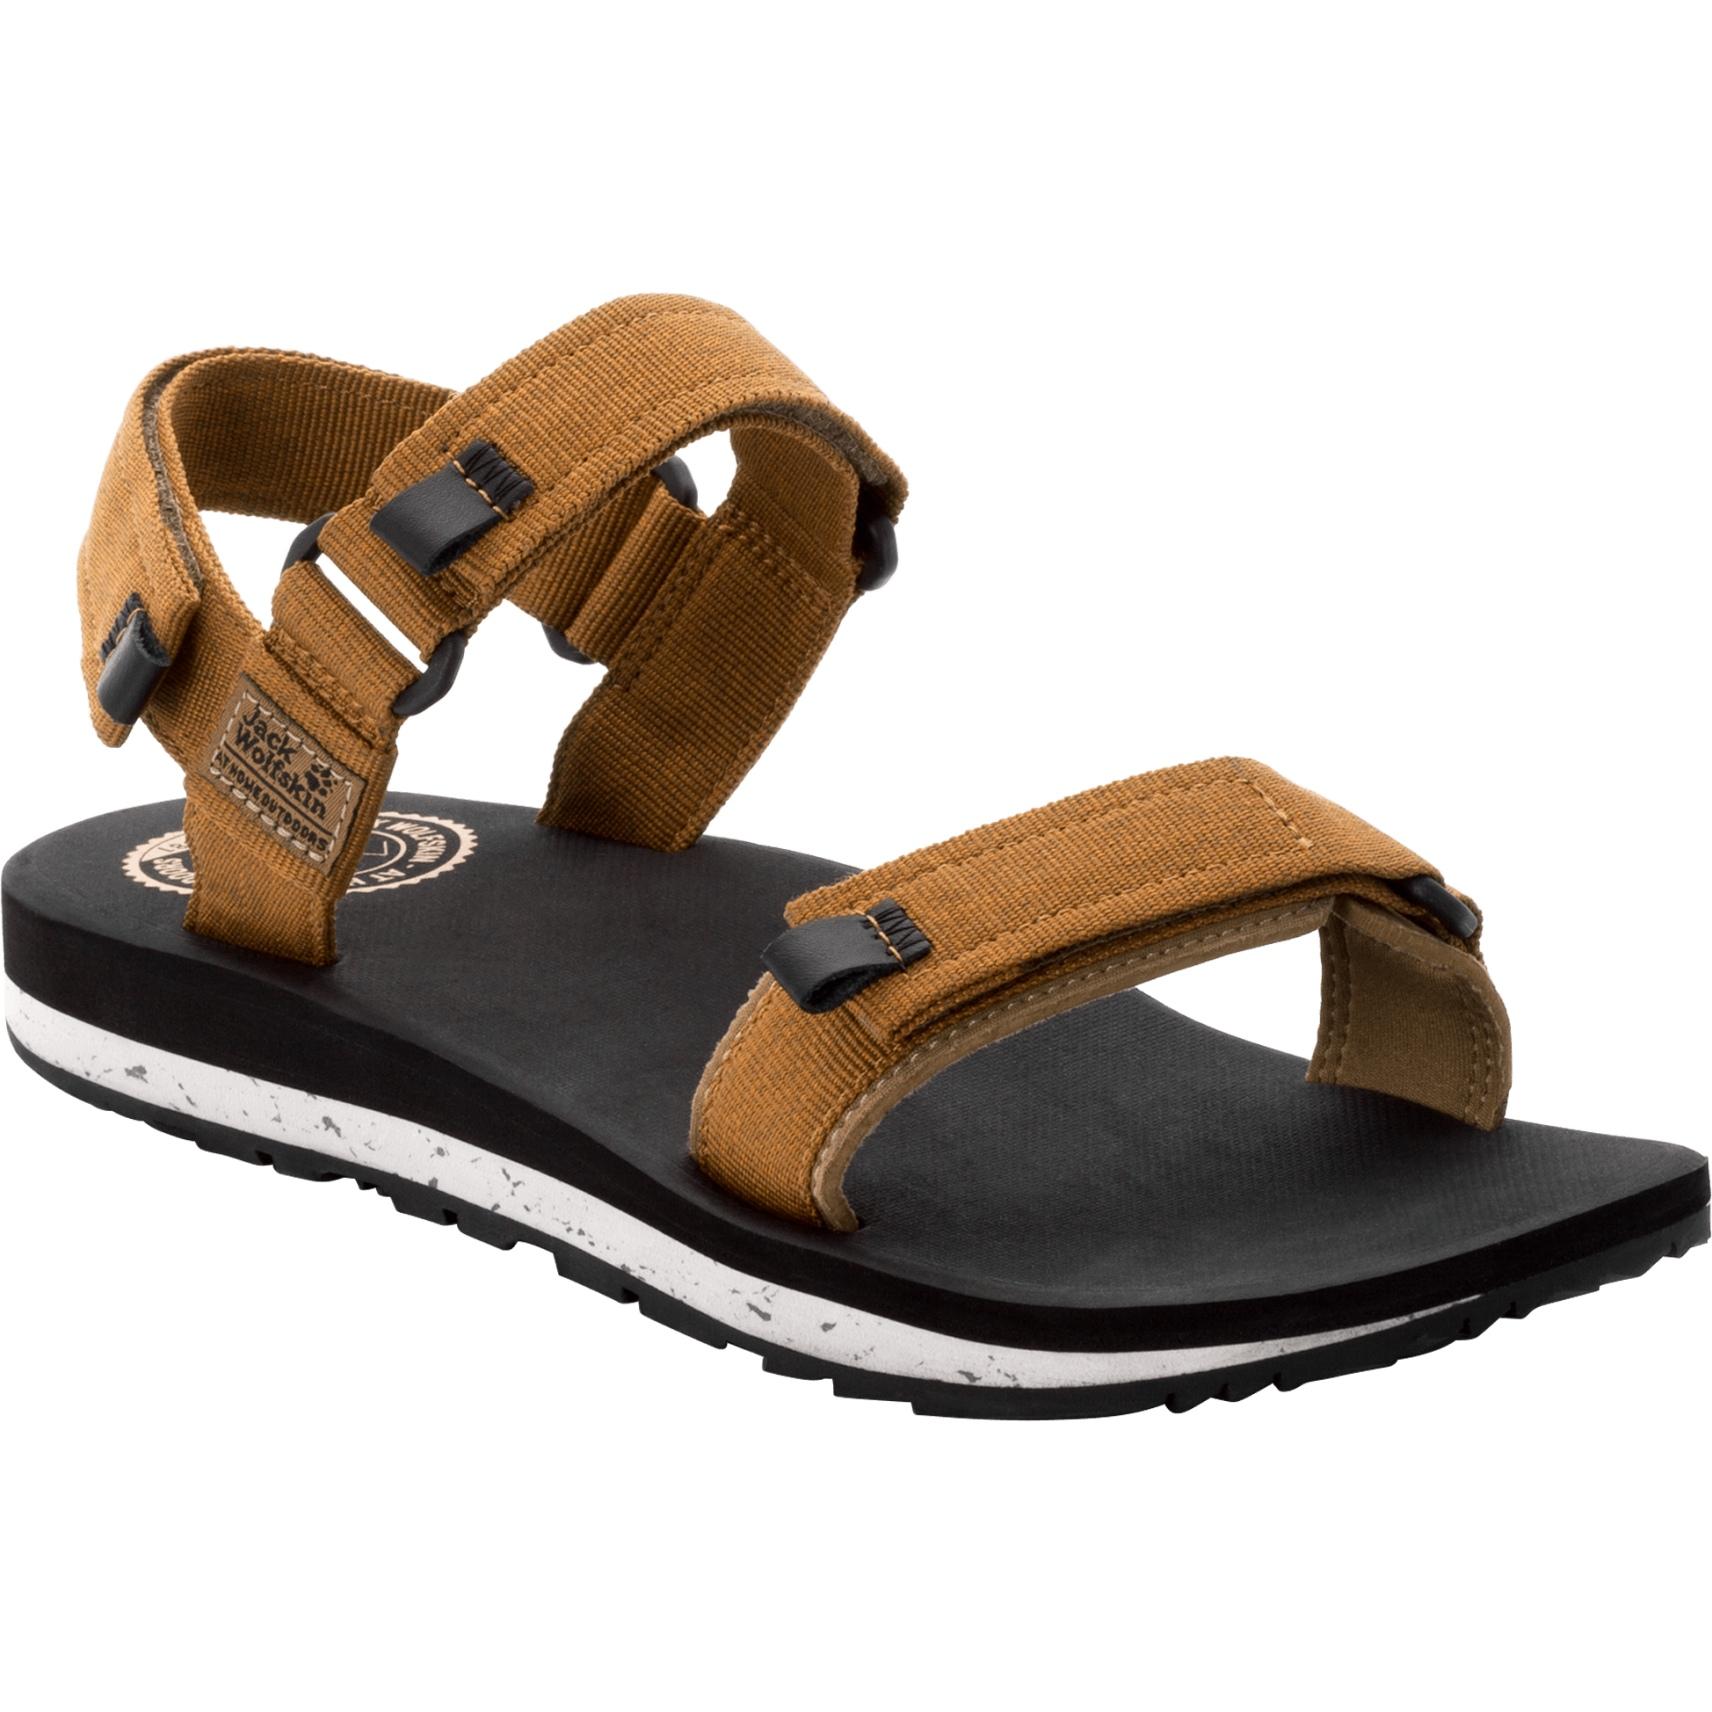 Jack Wolfskin Outfresh Sandal M - light brown/light grey